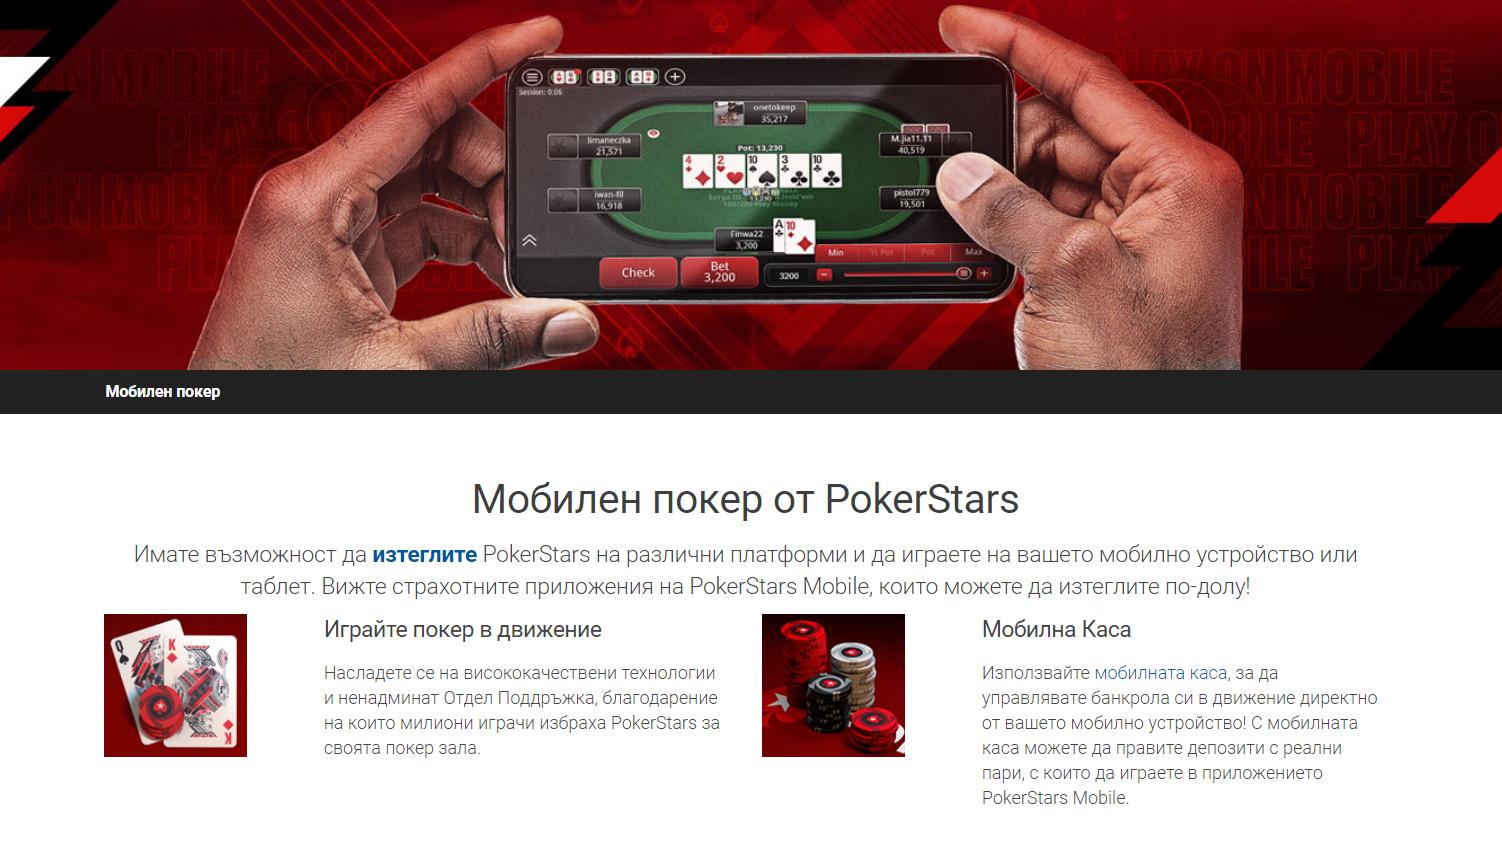 pokerstars mobilno